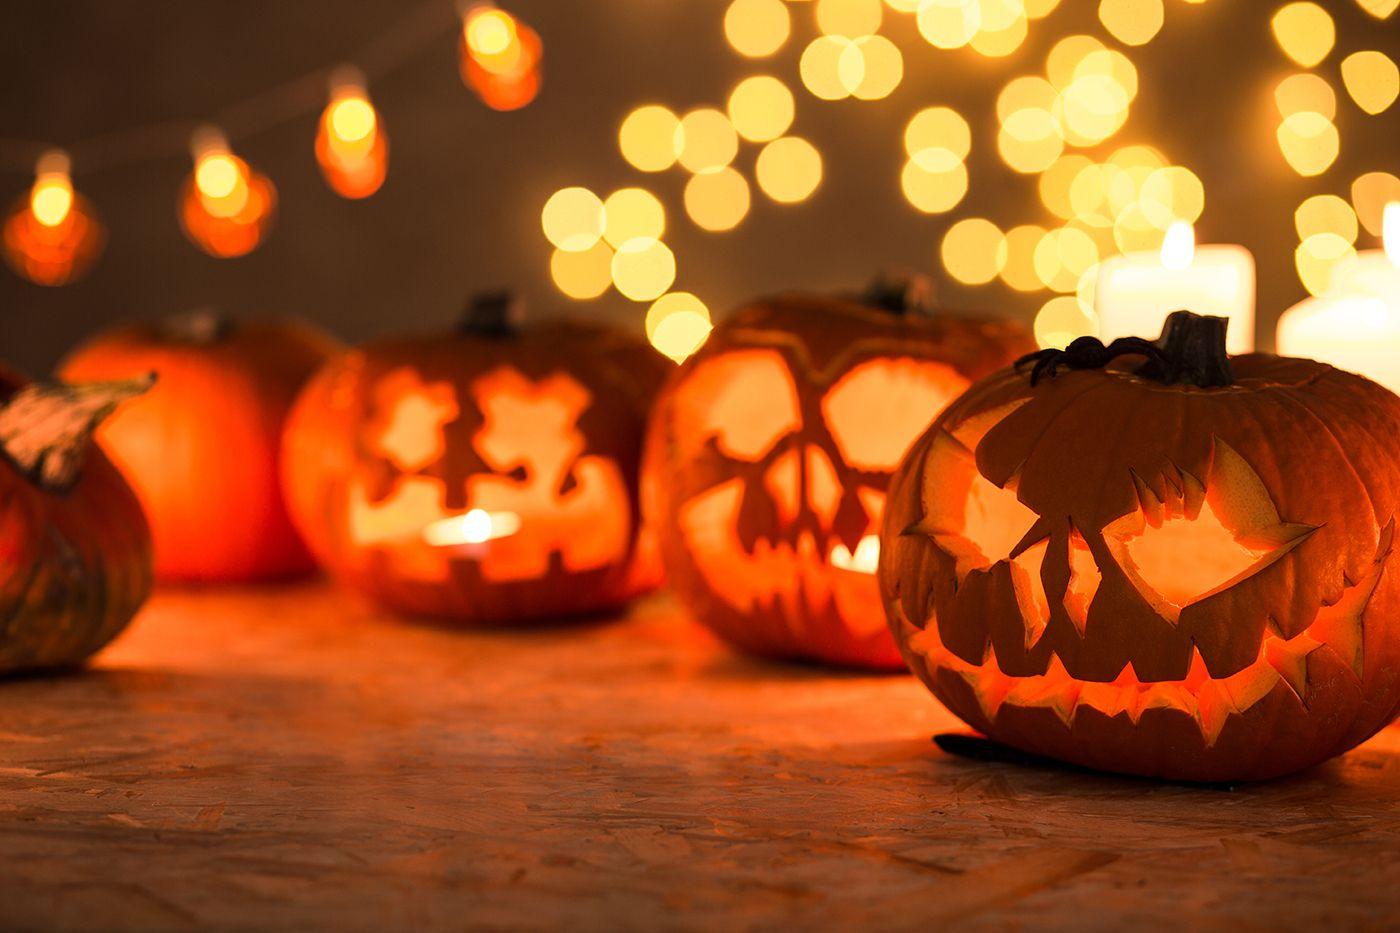 Halloween Festival Akron Ohio 2020 DeBord Halloween Festival 2020 in Akron, OH | Halloween funny, Up